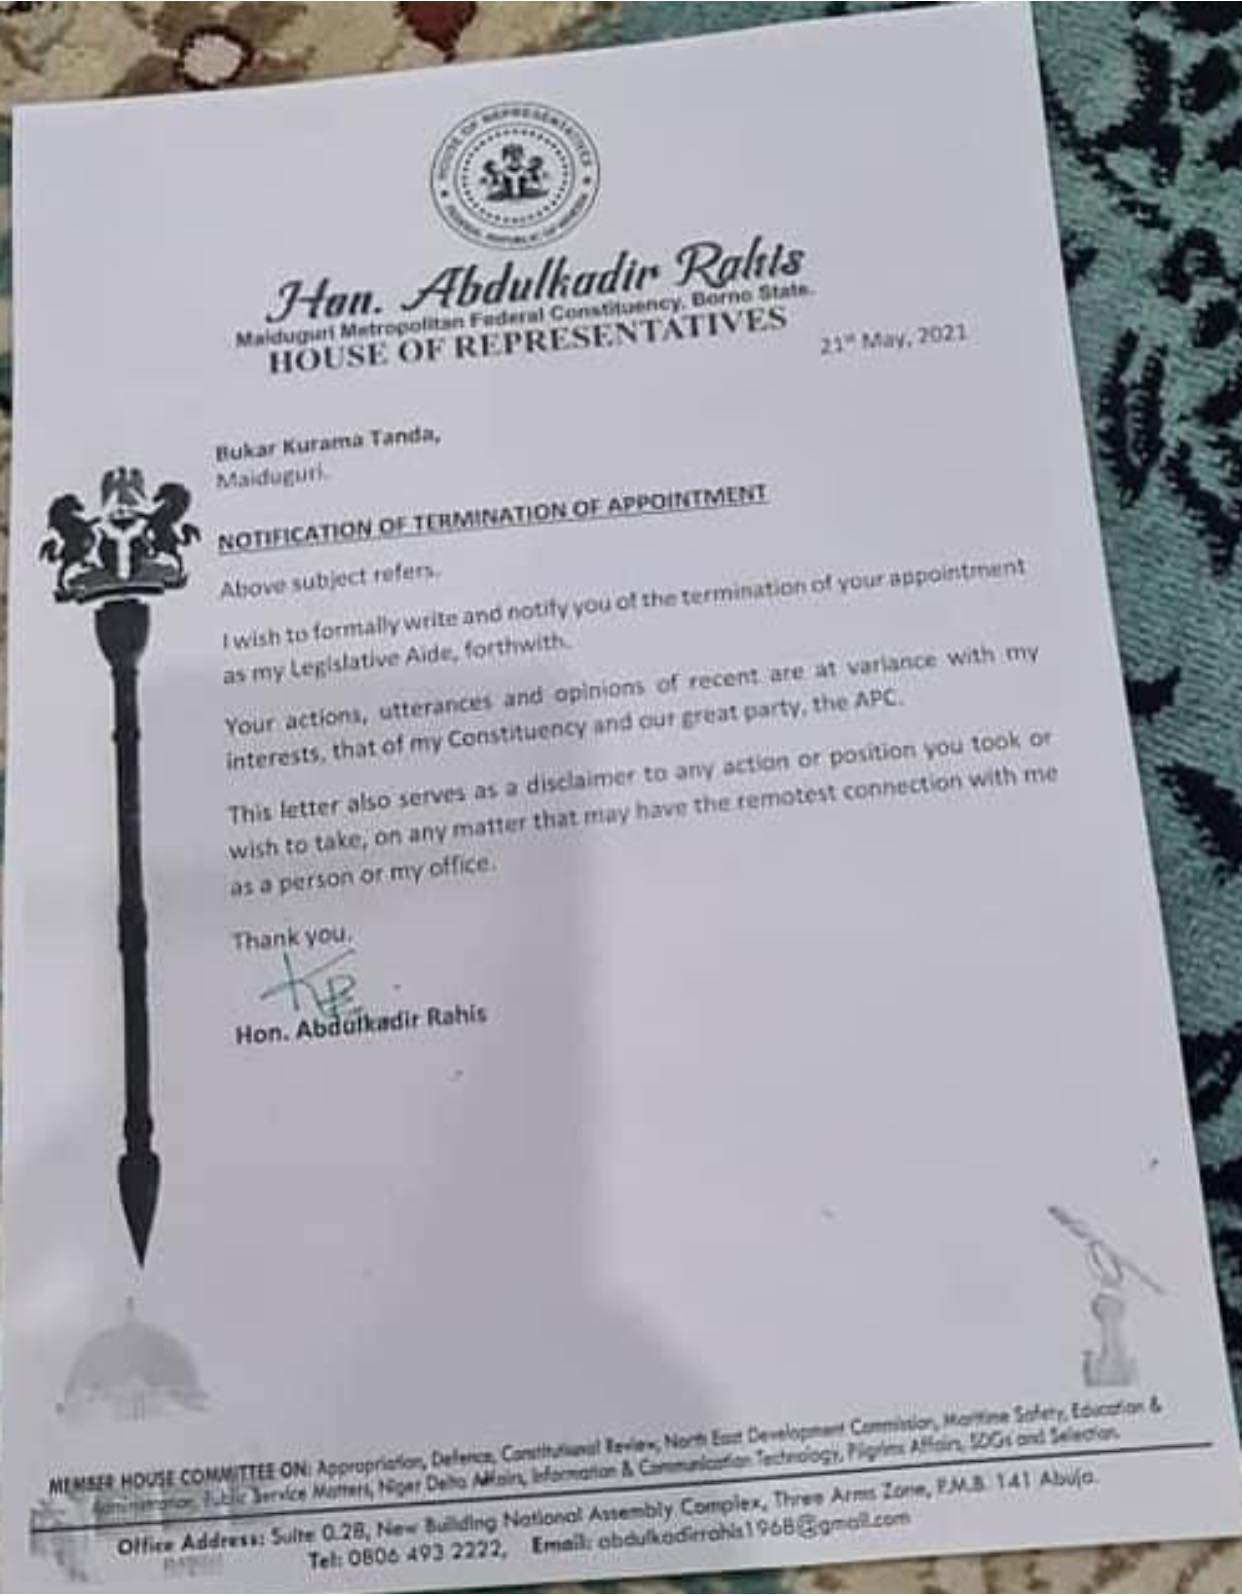 Borno House of Reps member sacks aide for describing Boko Haram leader as 'true hero'